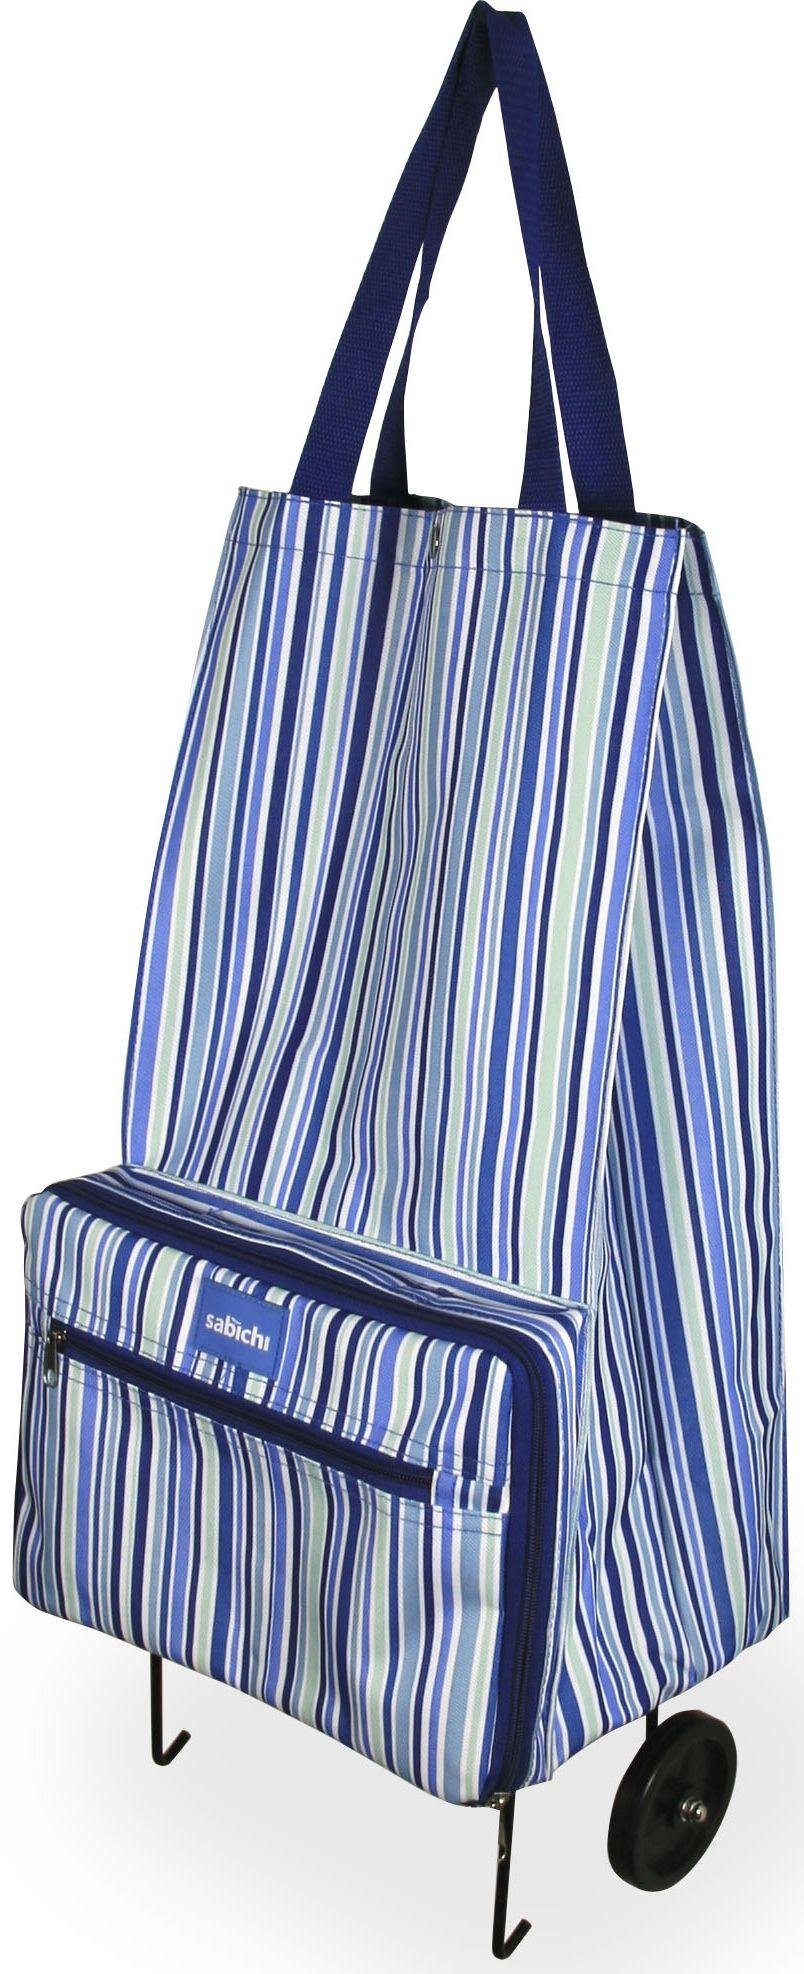 Image of Sabichi - Blue Stripe Shopping Bag with Wheels